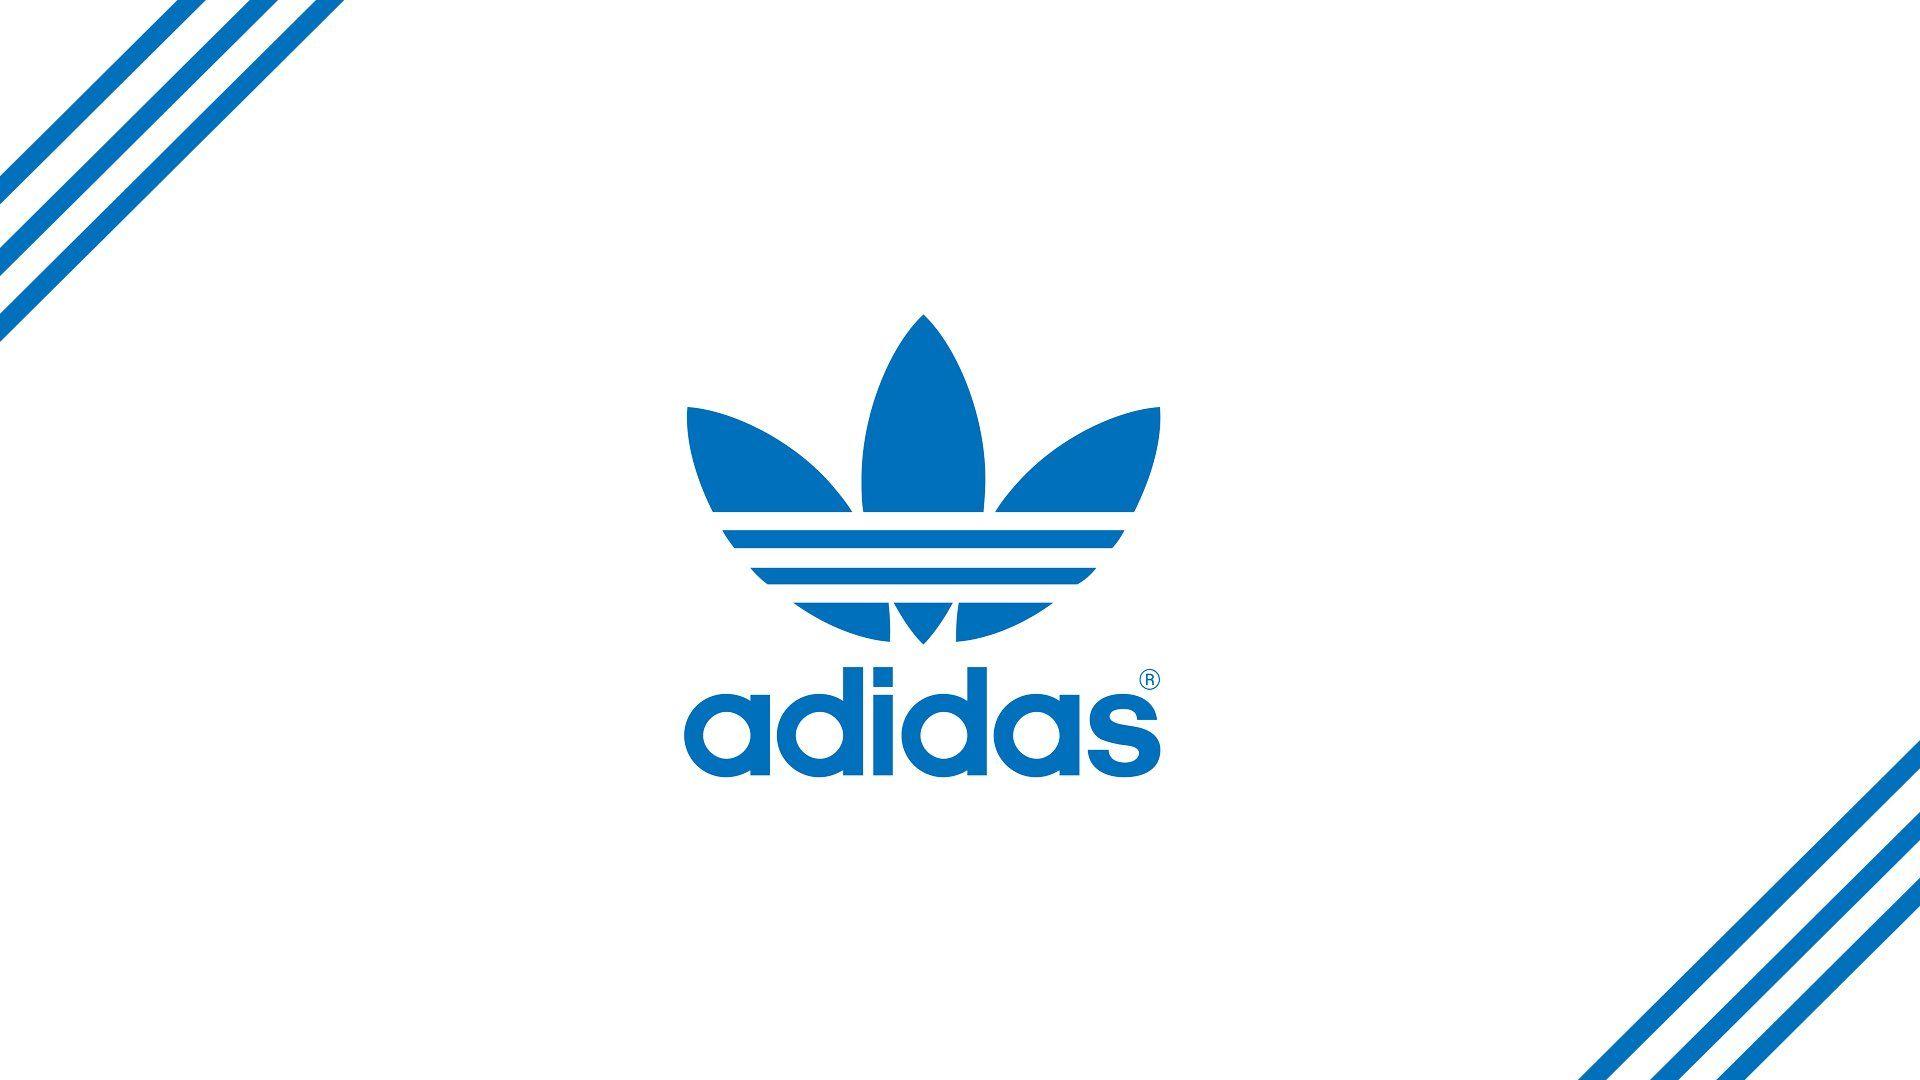 The Logo Of Adidas